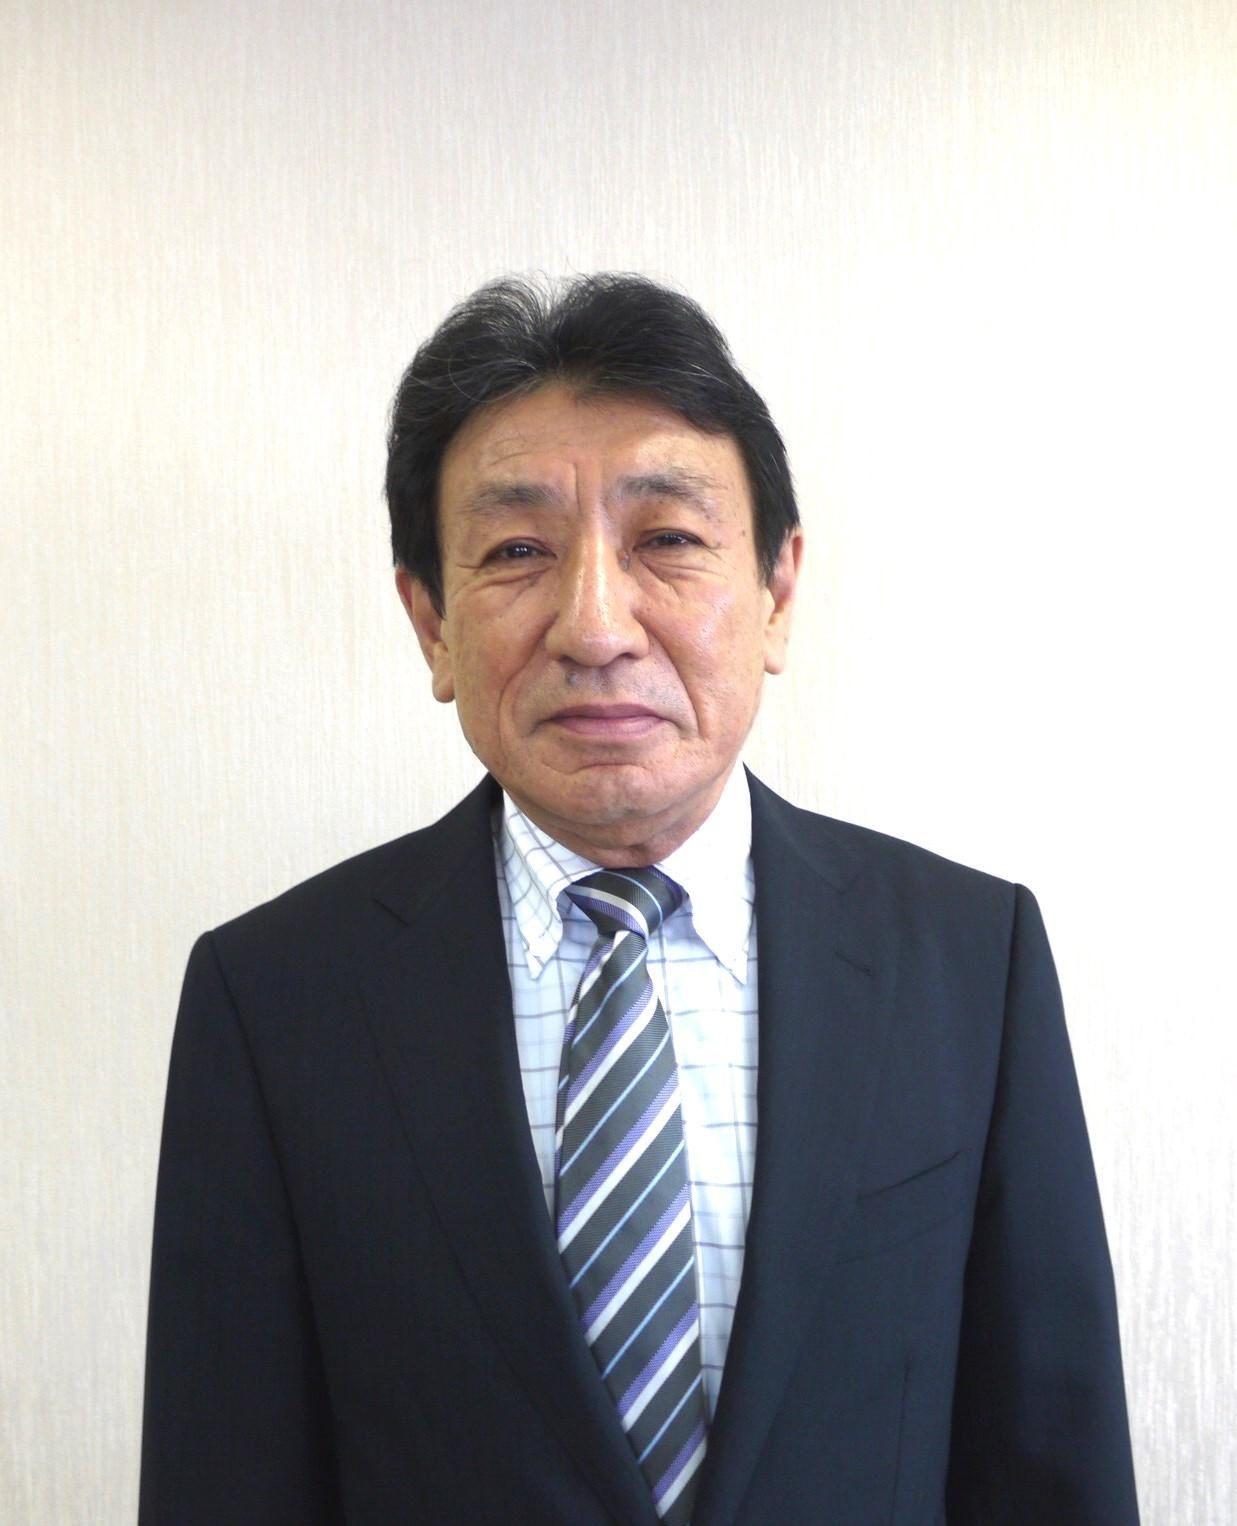 久保 信保 (Mr Nobuyasu Kubo)